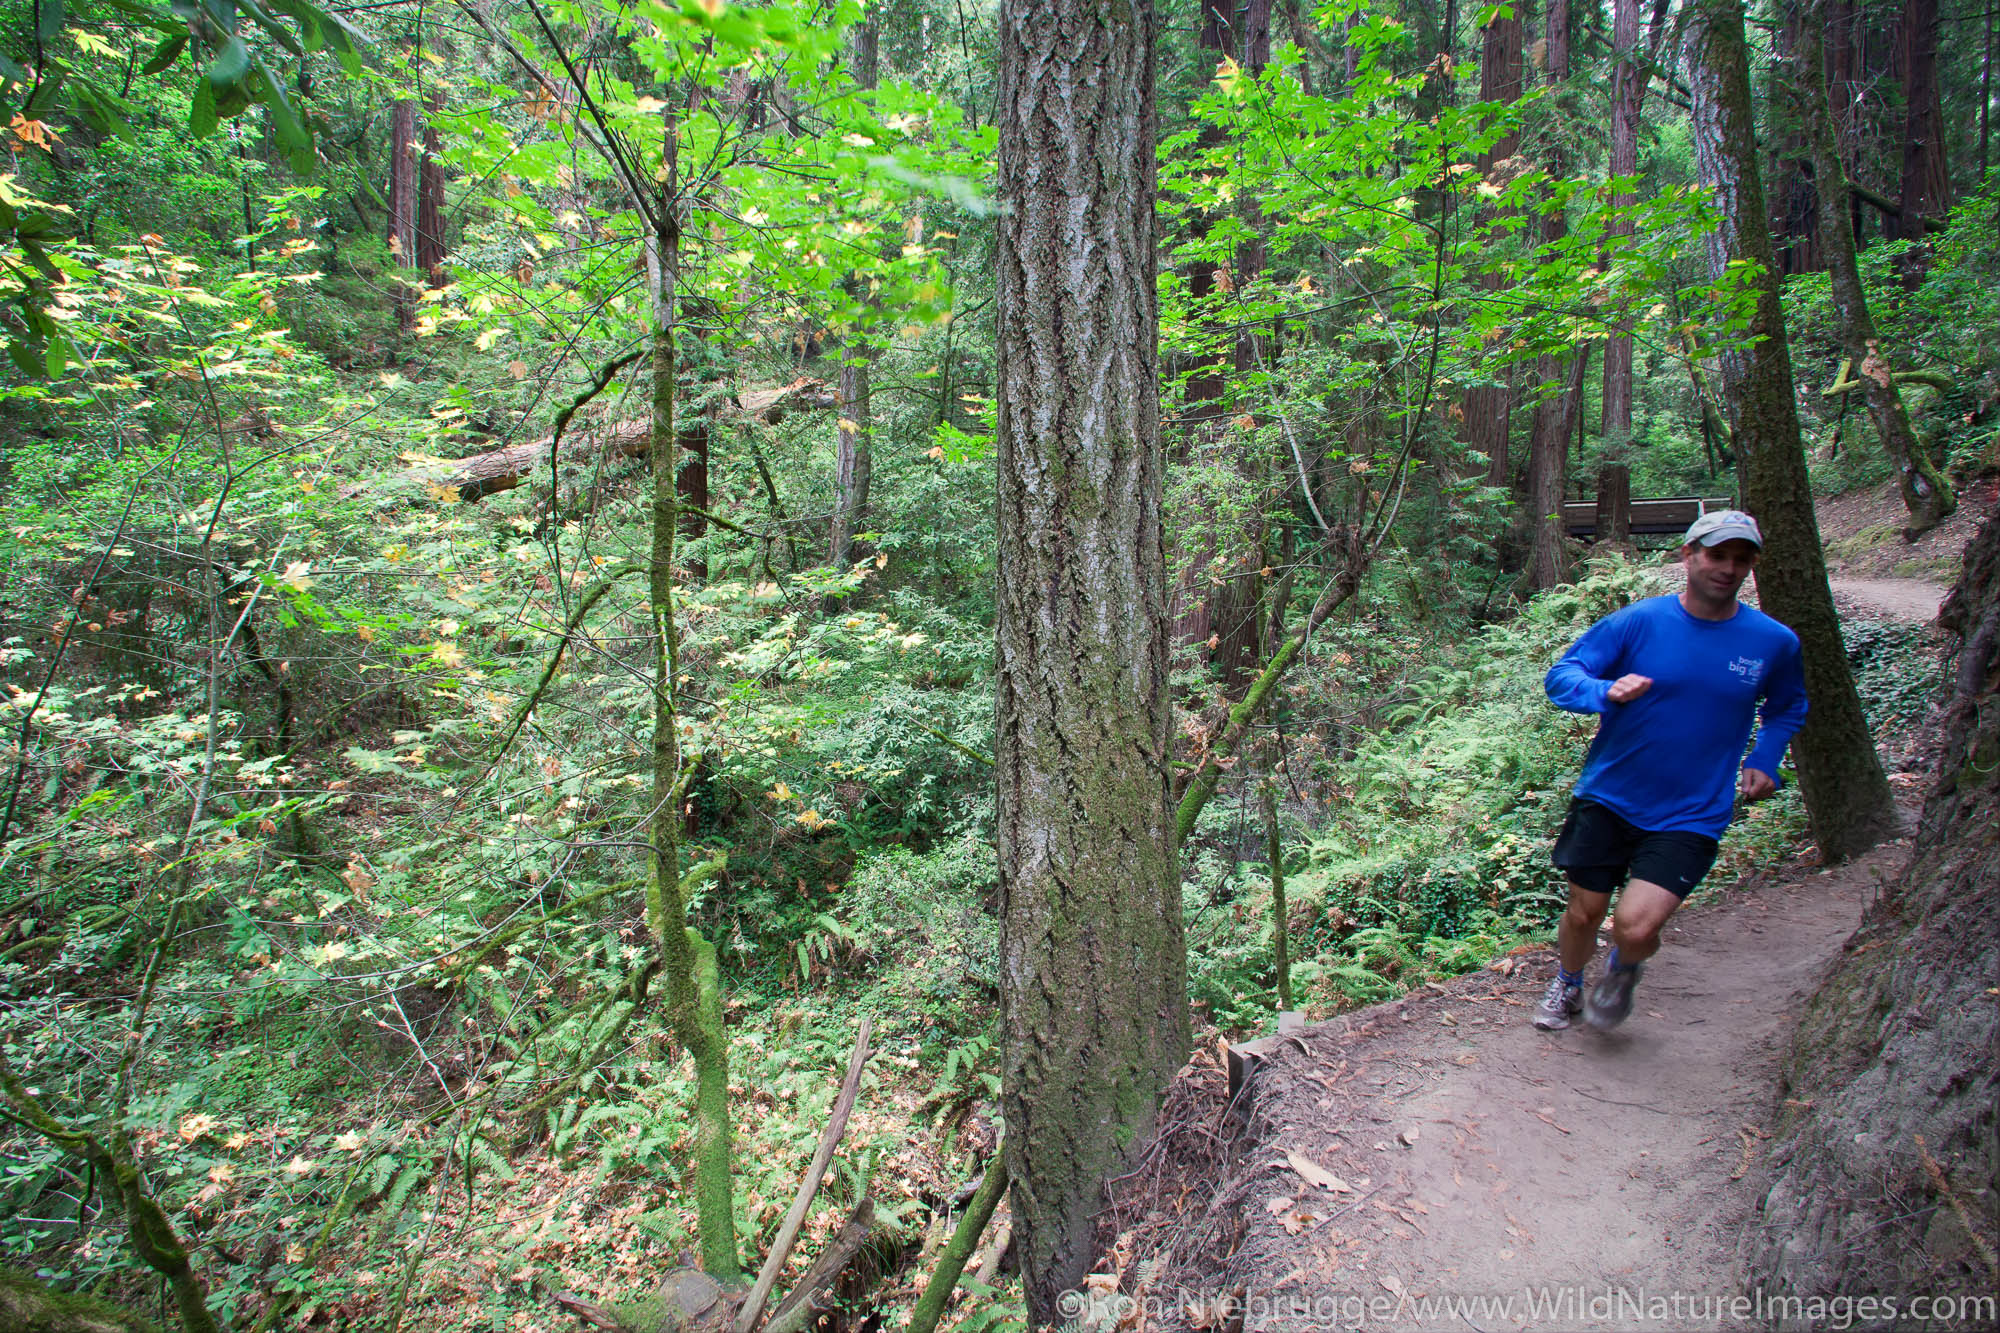 Trail running in The Forest of Nisene Marks State Park, Aptos, California (model released)